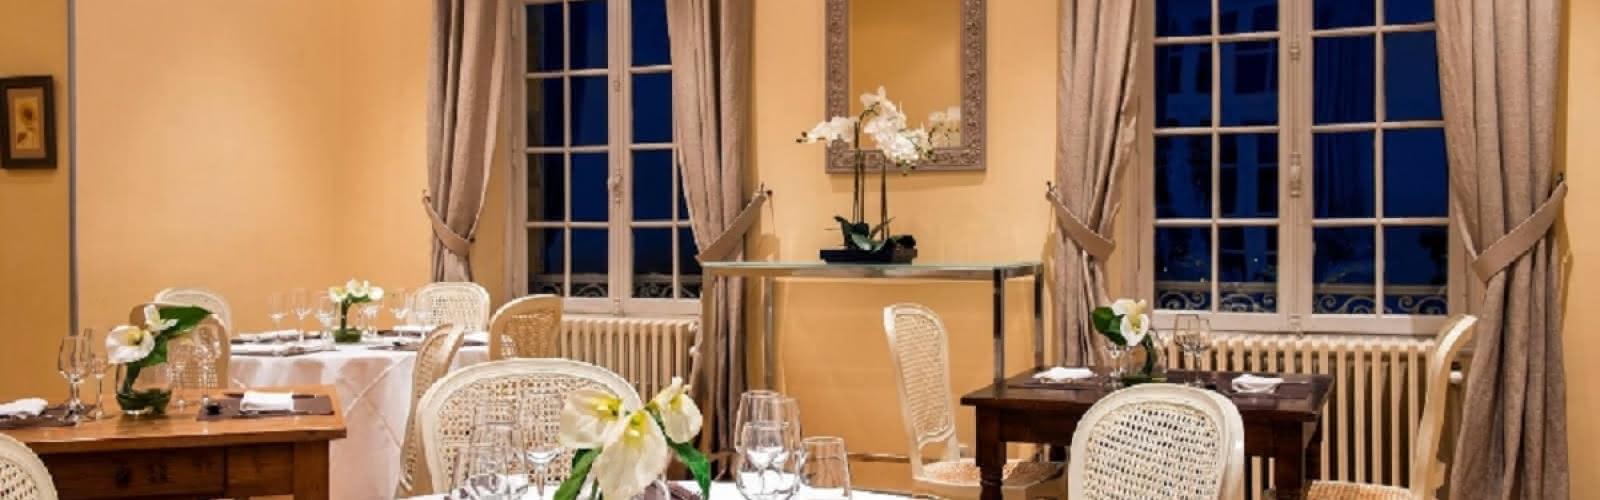 Le Club Restaurant de l'Hermitage